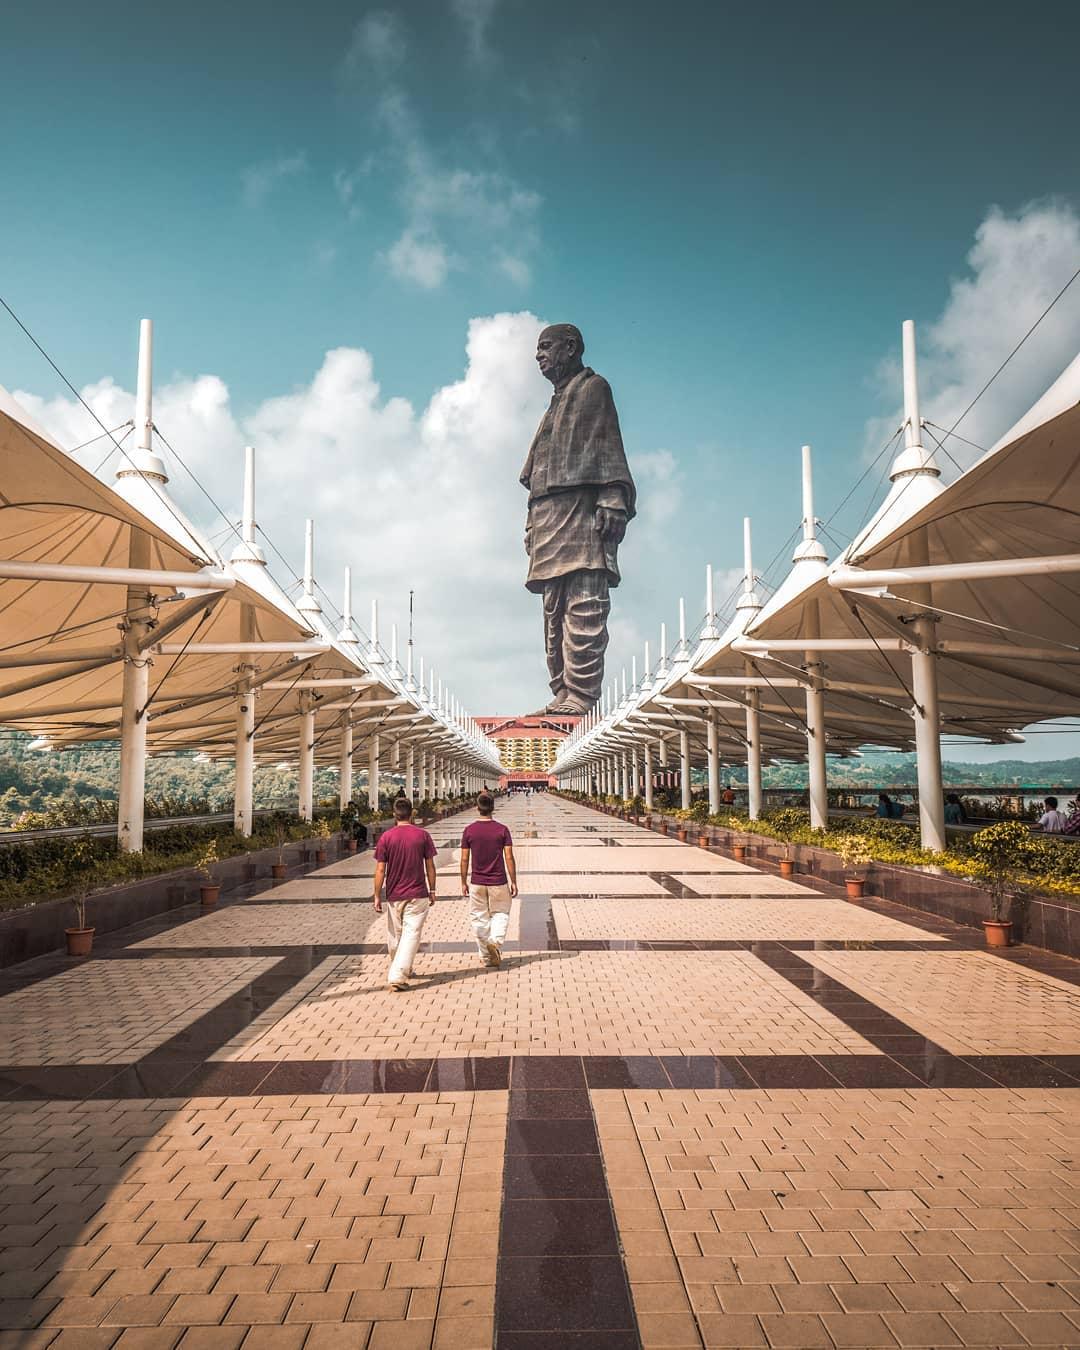 Instagrammable Spots in Gandhi Circuit Gujarat India - Statue of Unity